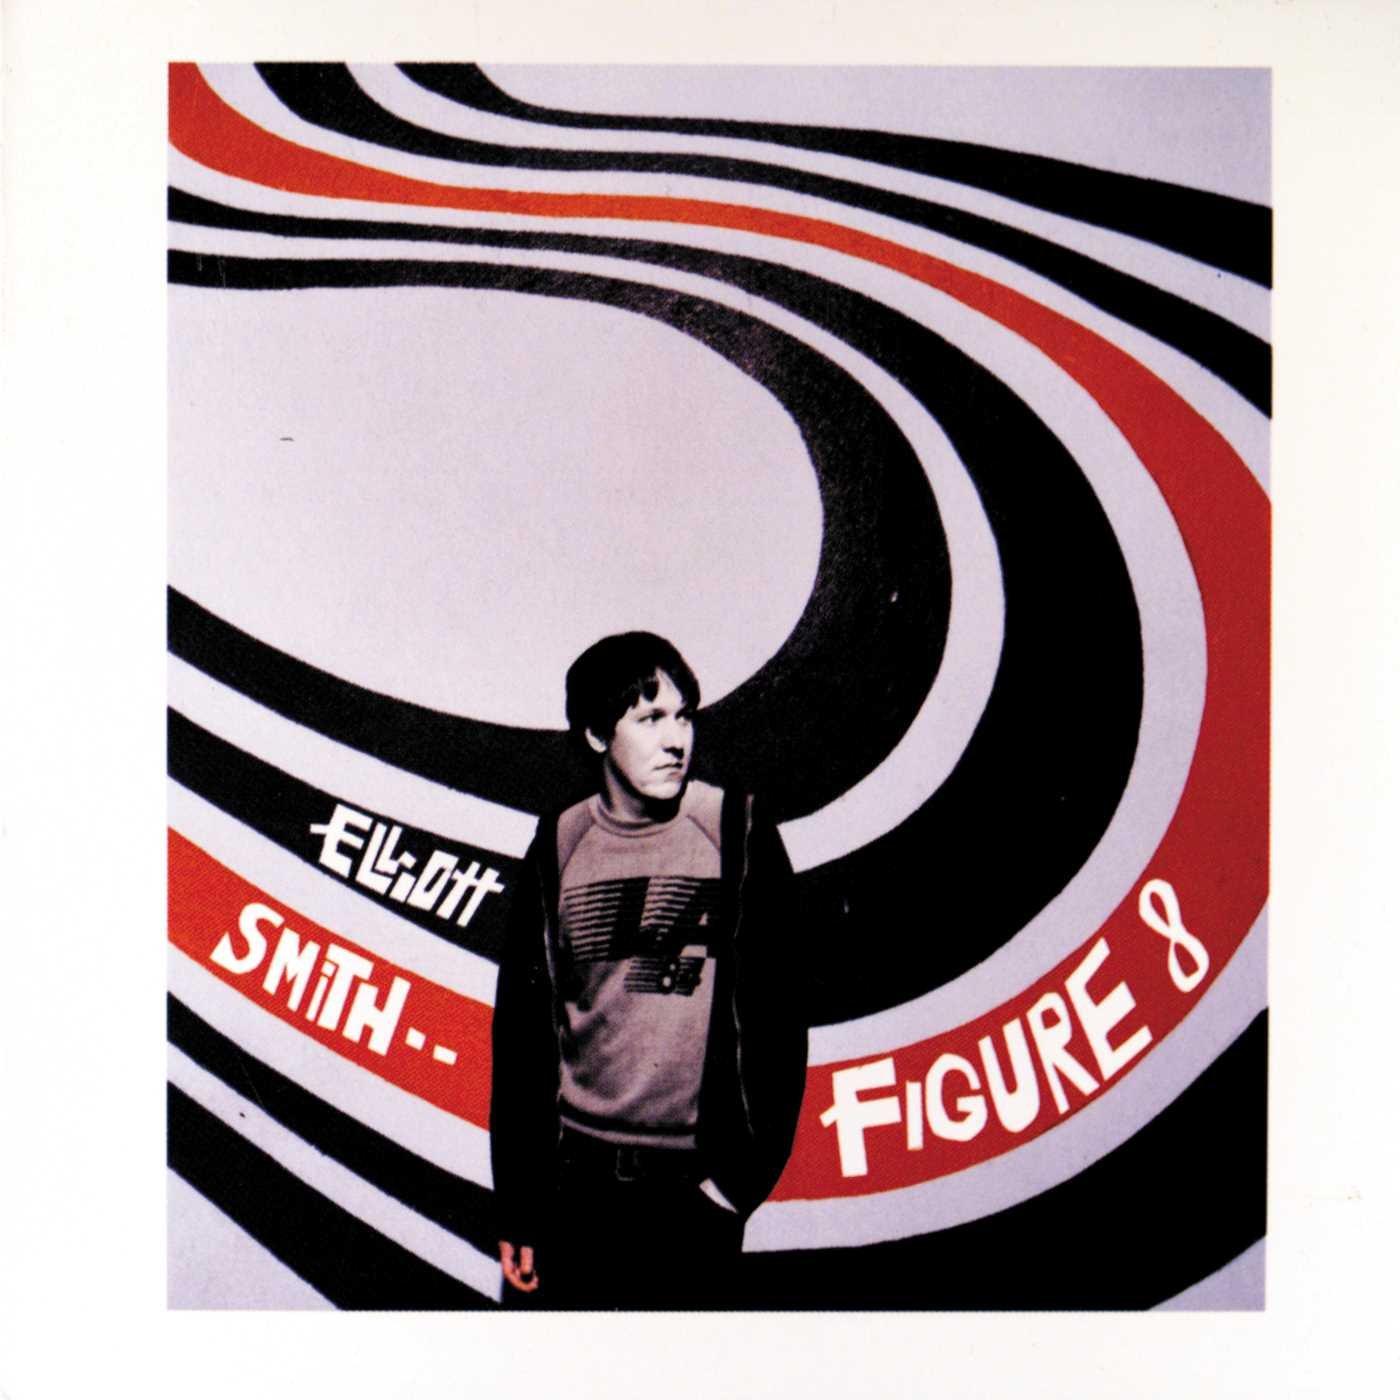 Elliott Smith Figure 8 deluxe digital edition